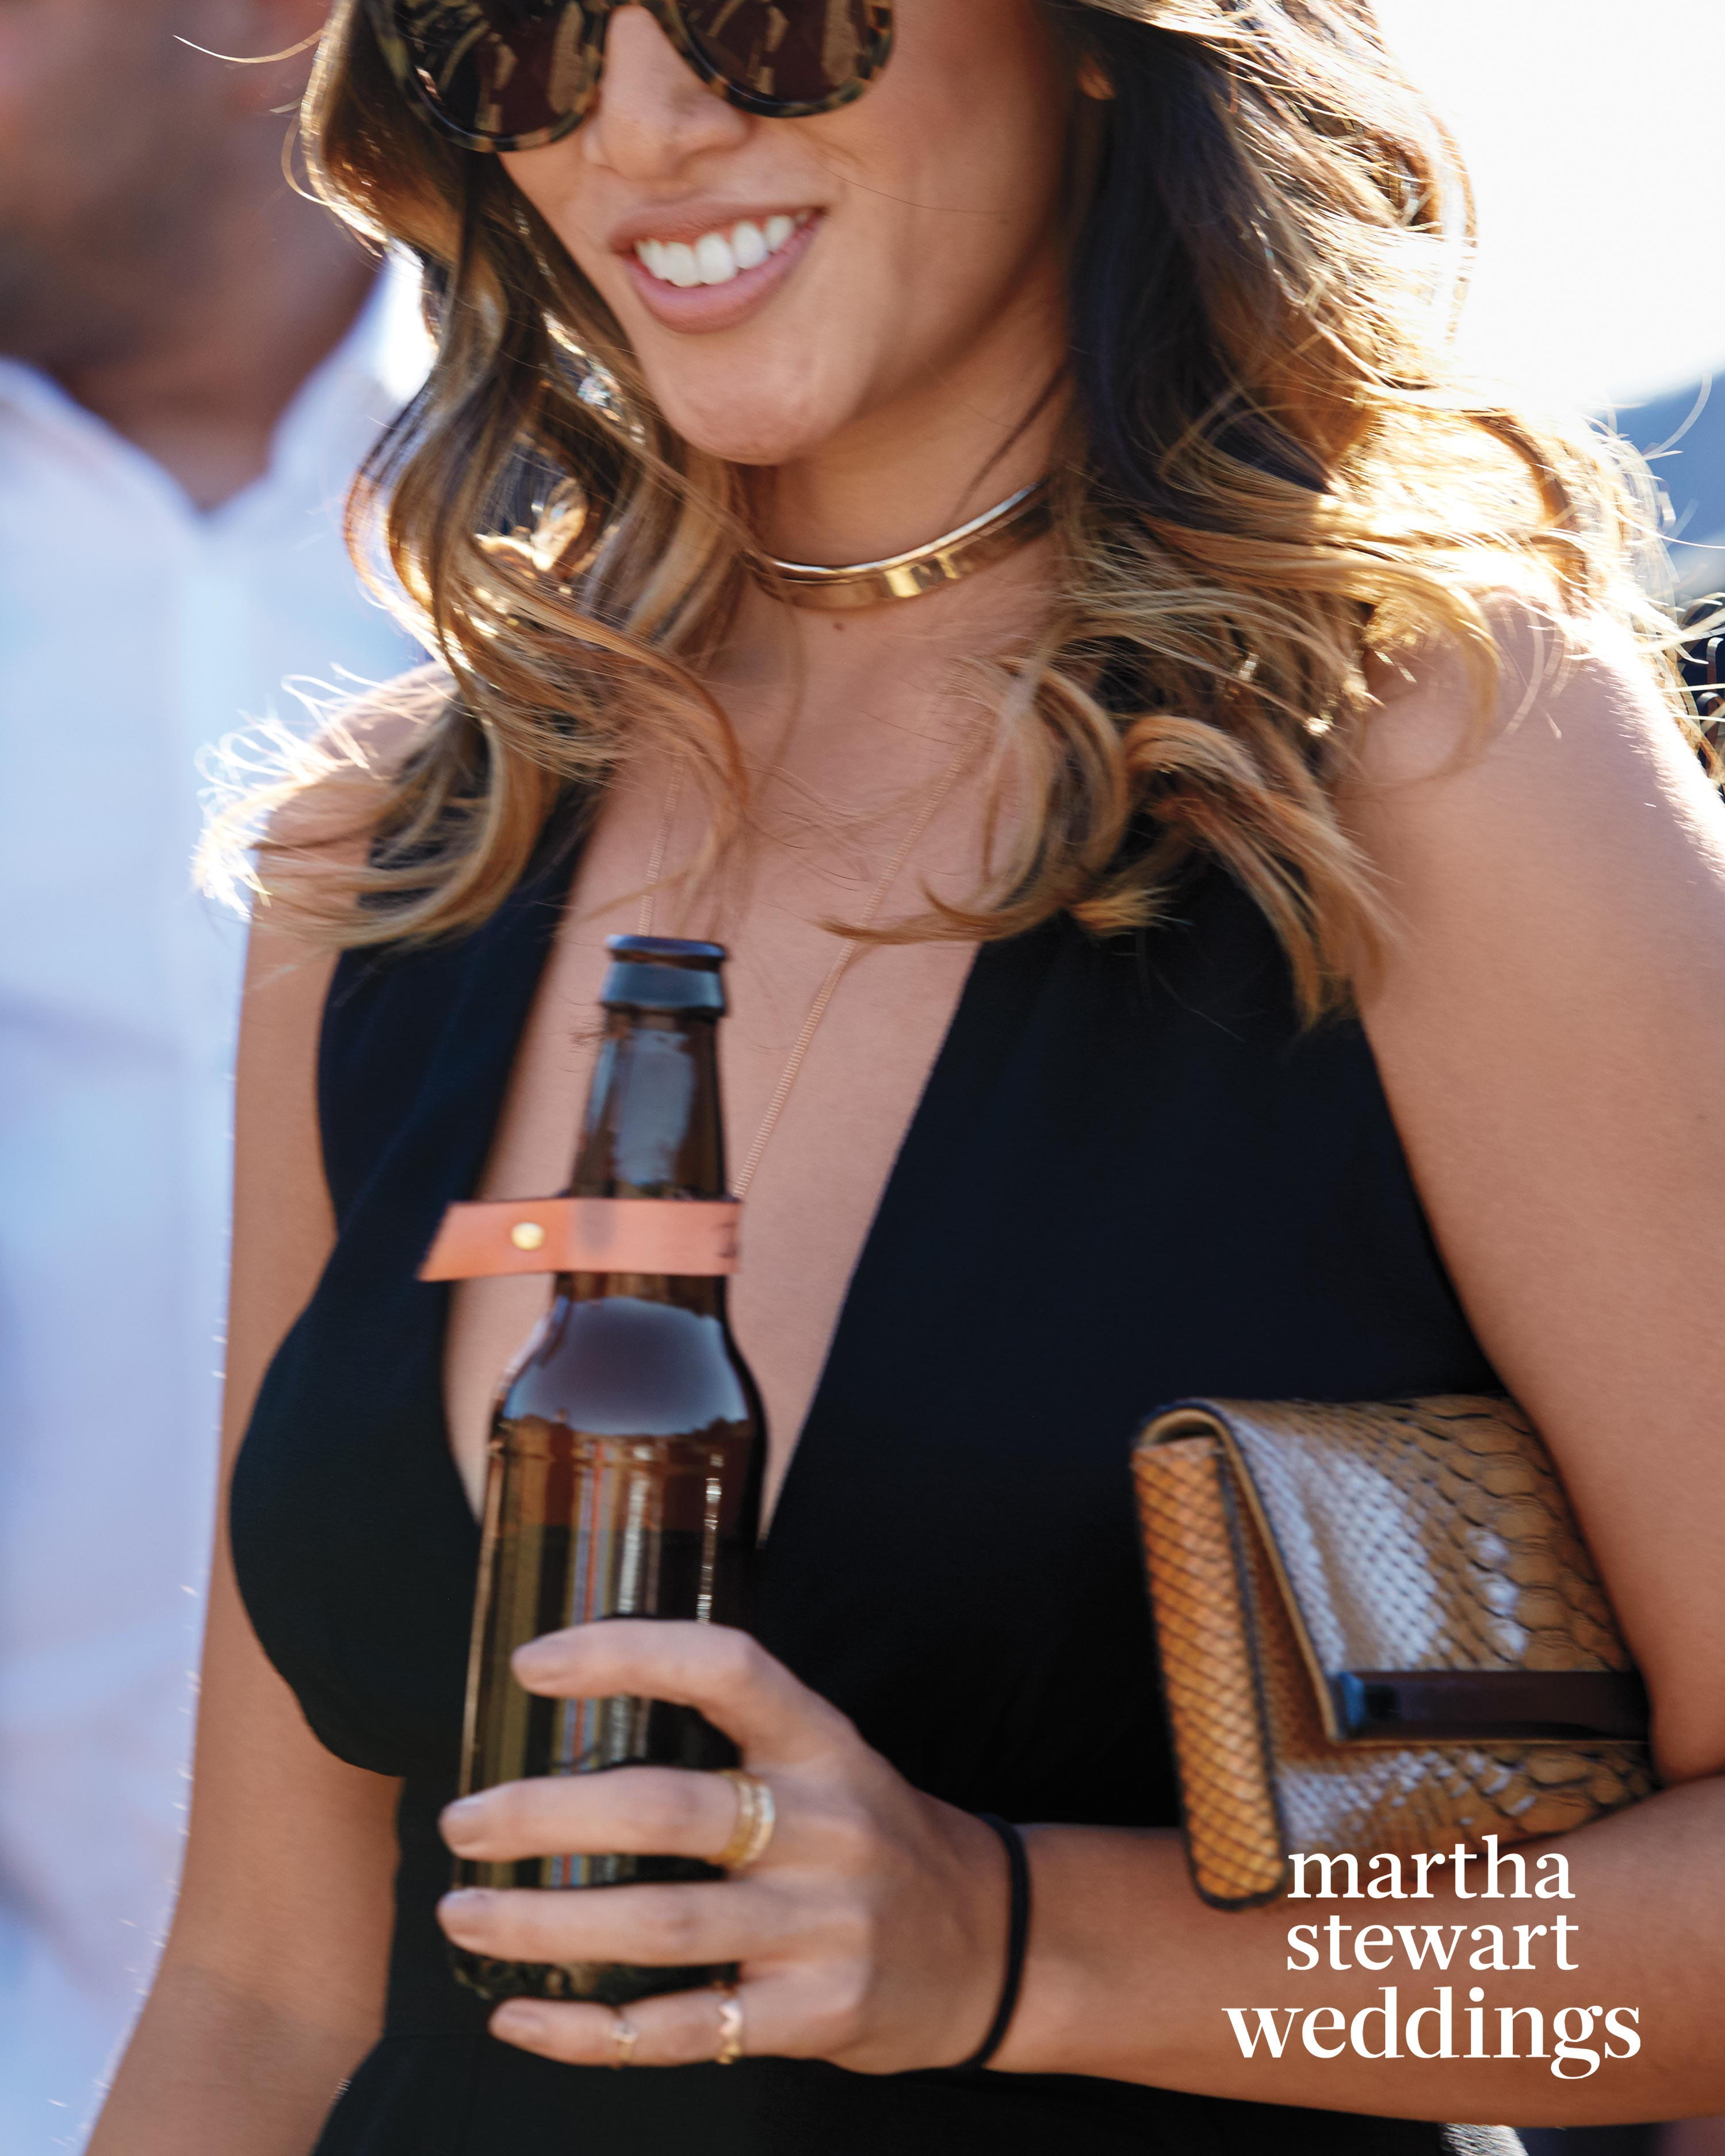 jamie-bryan-wedding-22-ceremony-beverages-2555-d112664.jpg